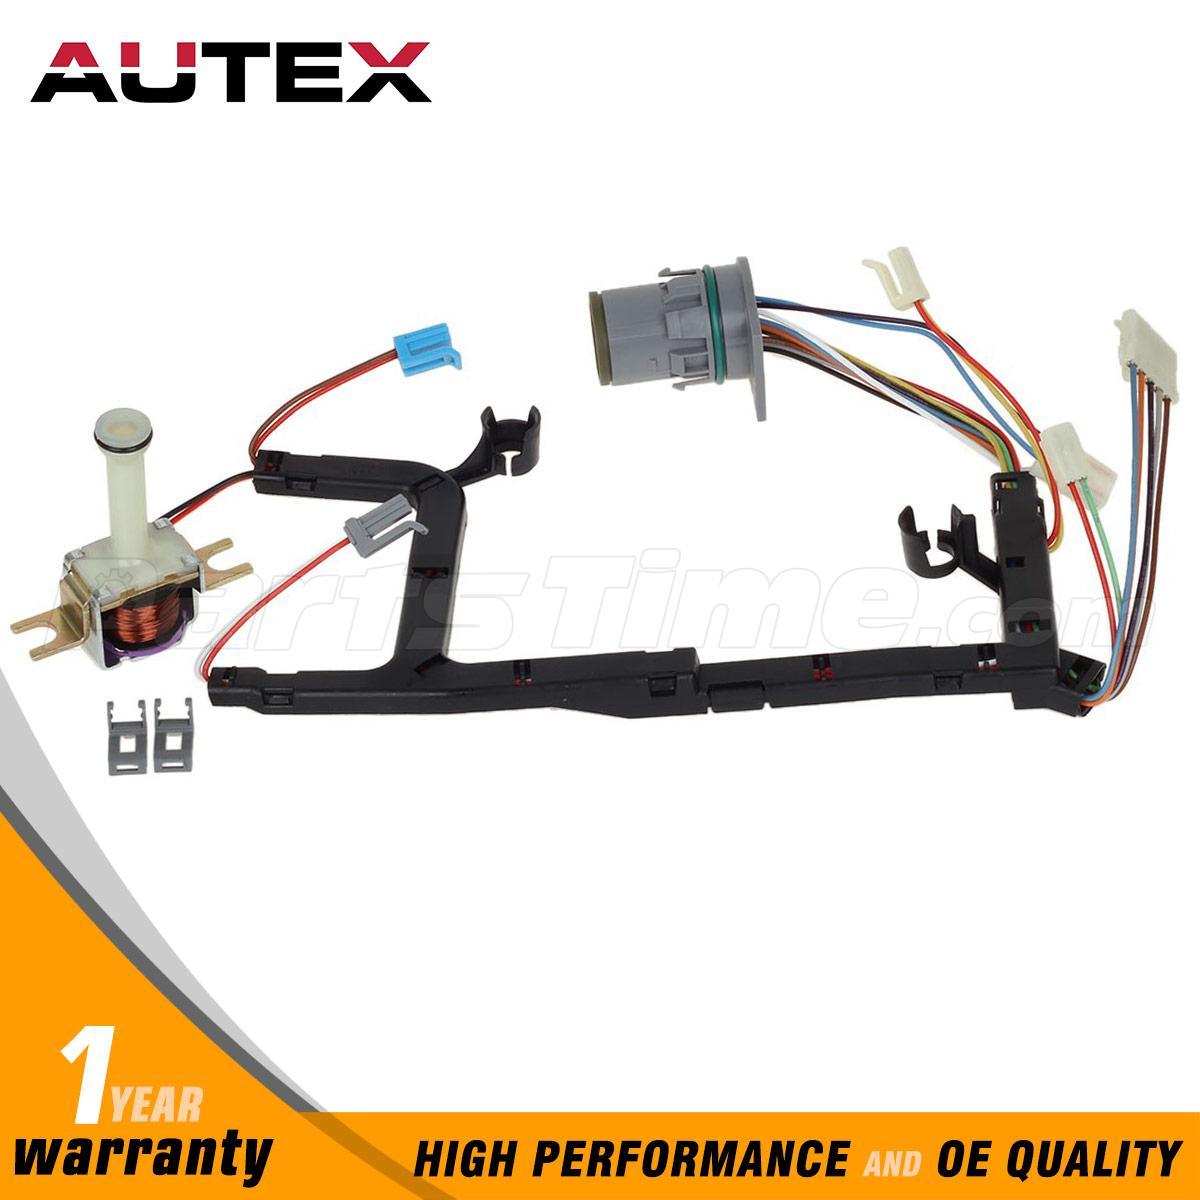 4l60e transmission internal wire harness w tcc solenoid 4l60e wiring harness test 4l60e wiring harness removal [ 1200 x 1200 Pixel ]